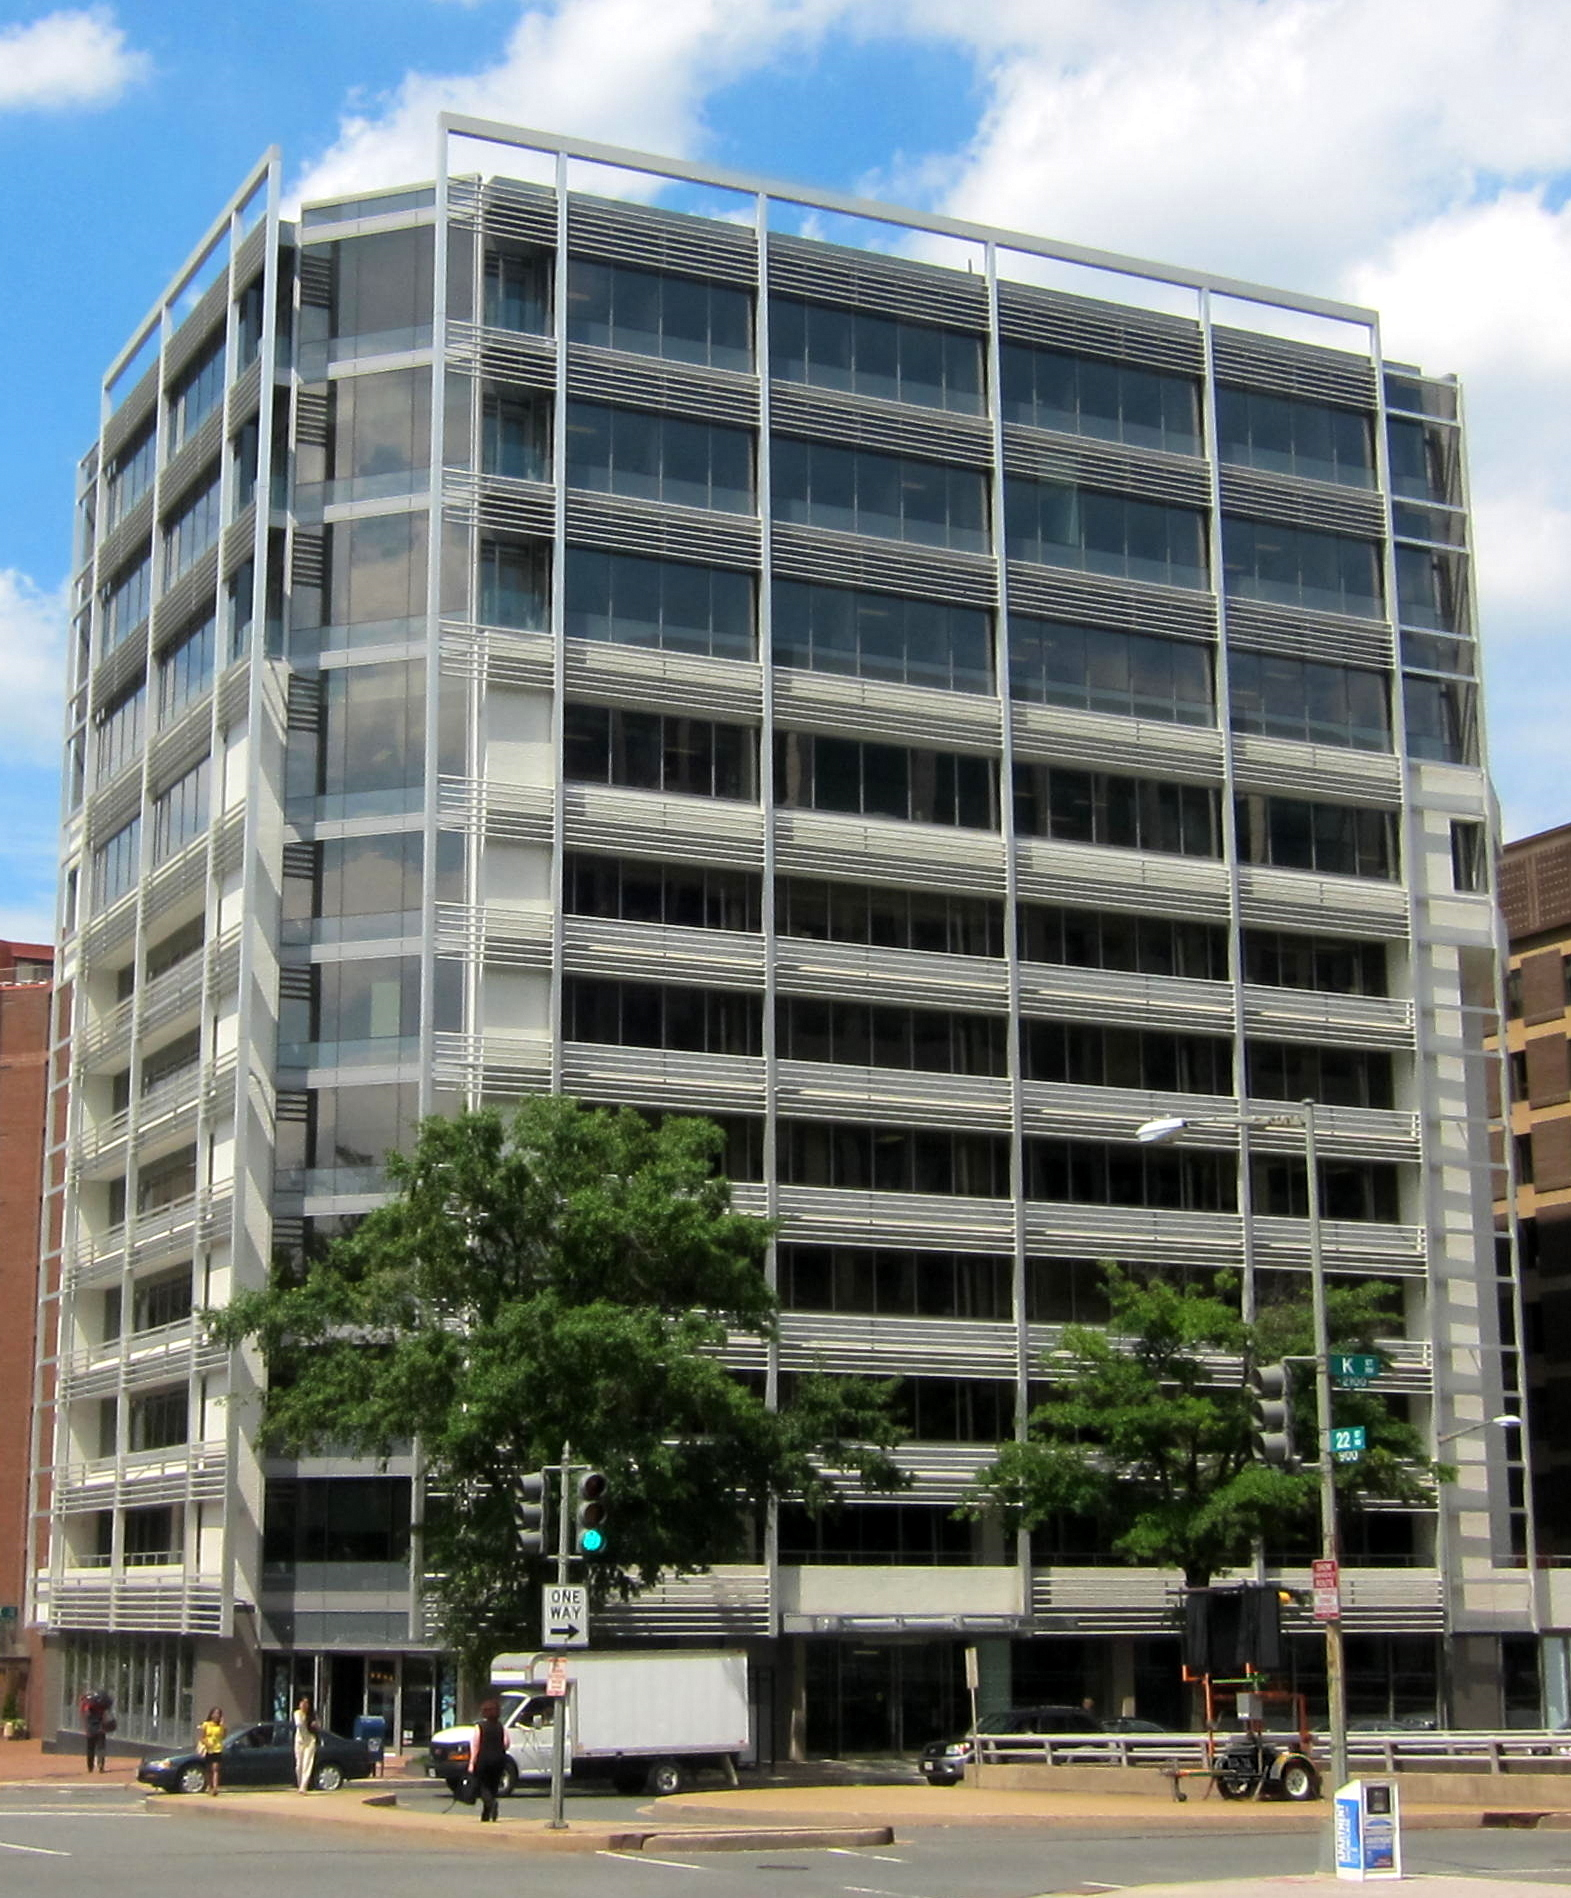 Washington Buildings